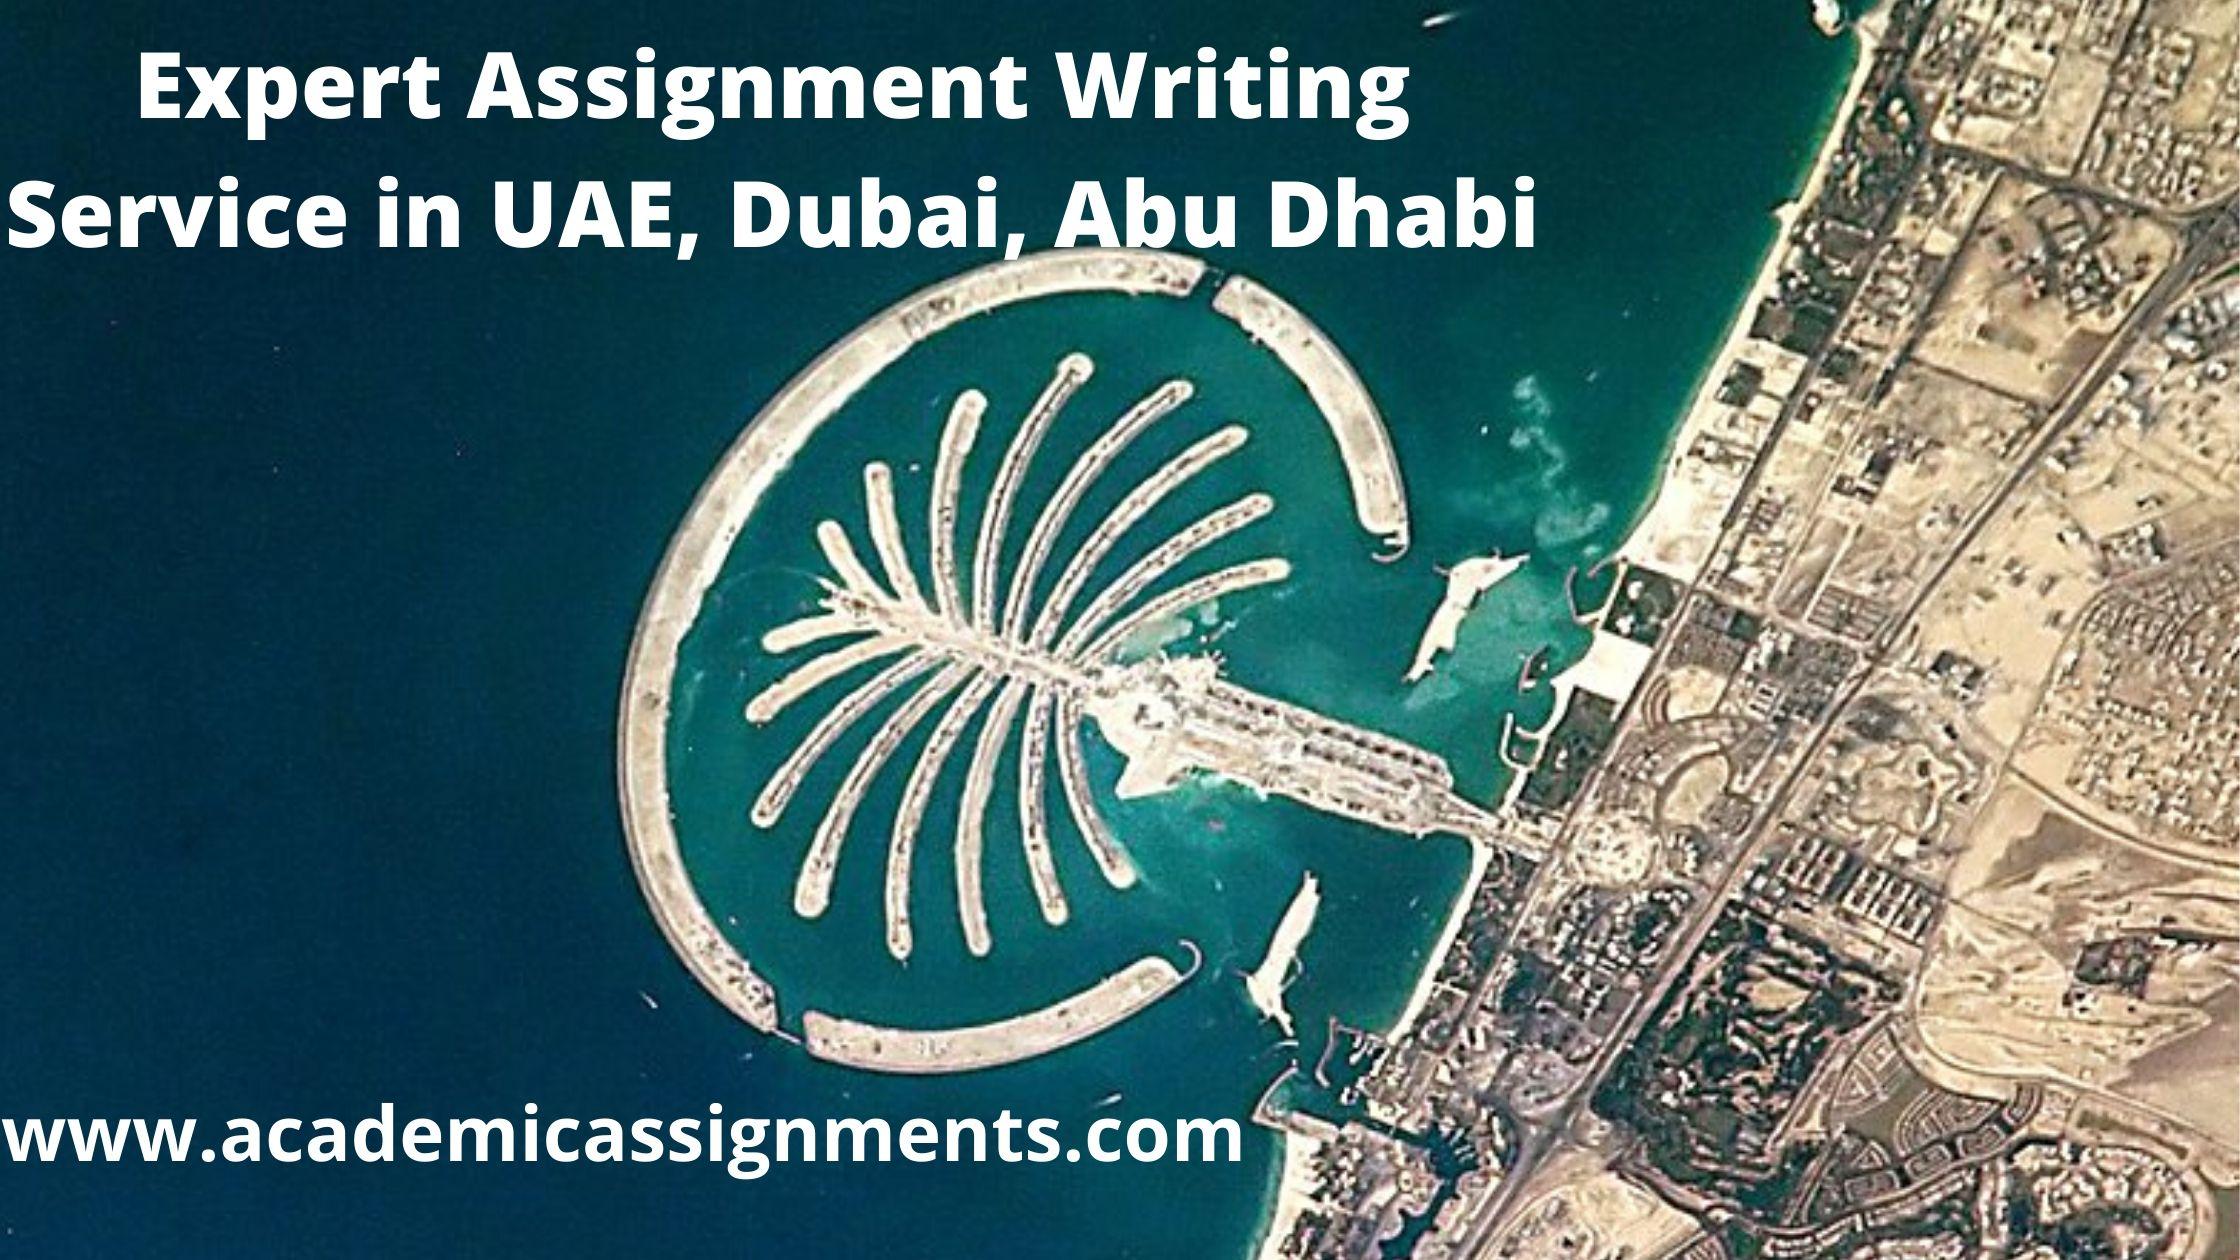 Expert Assignment Writing Service in UAE, Dubai, Abu Dhabi